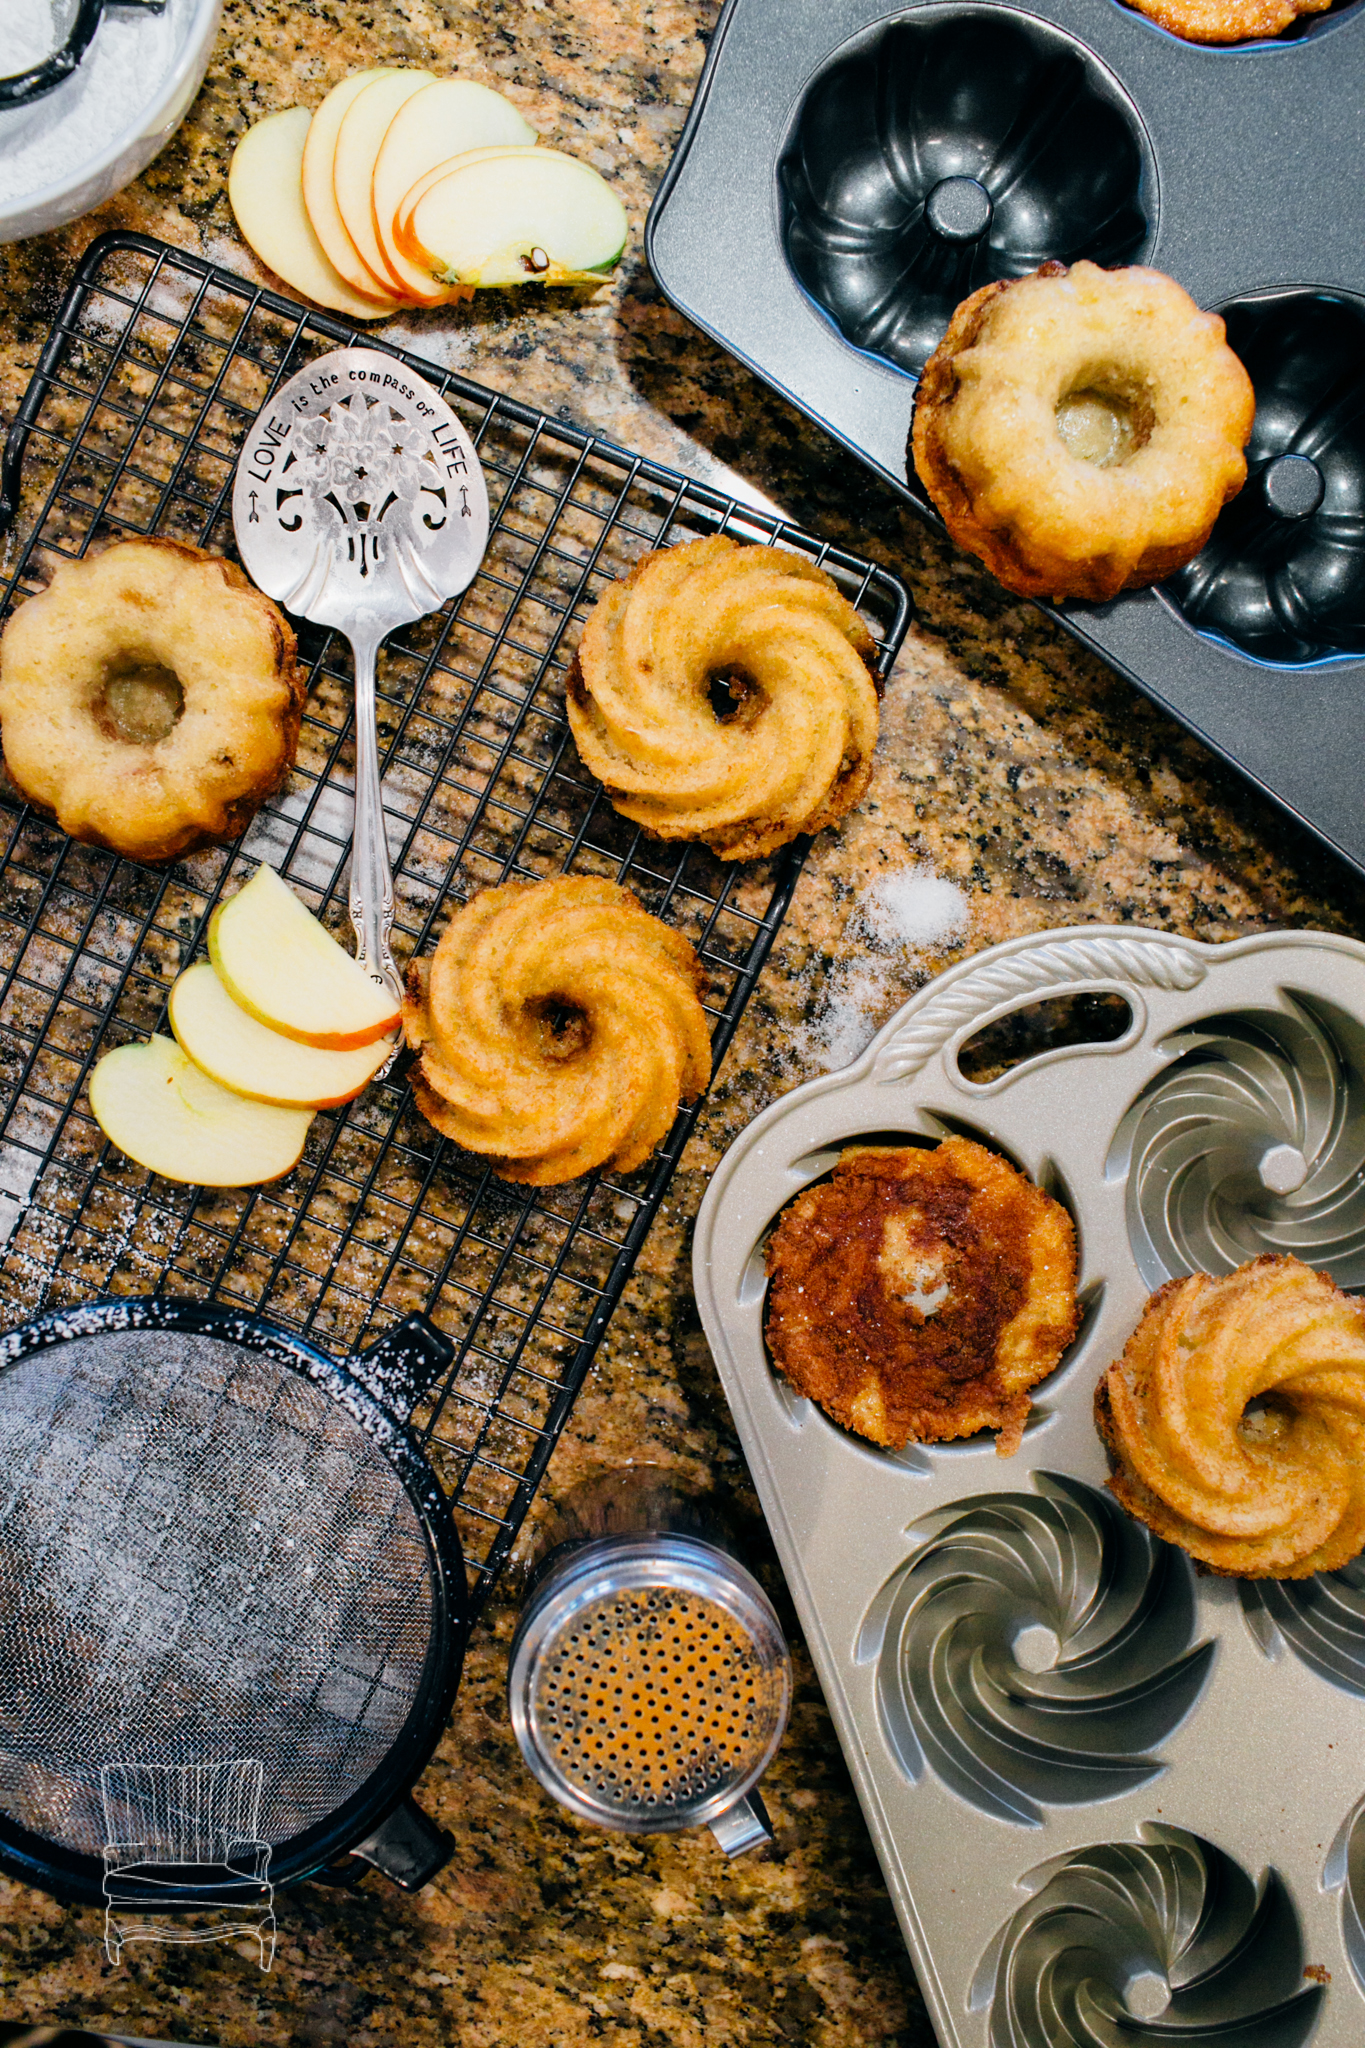 bellingham-seattle-marketing-food-photographer-dessert-slice-of-heaven-3.jpg